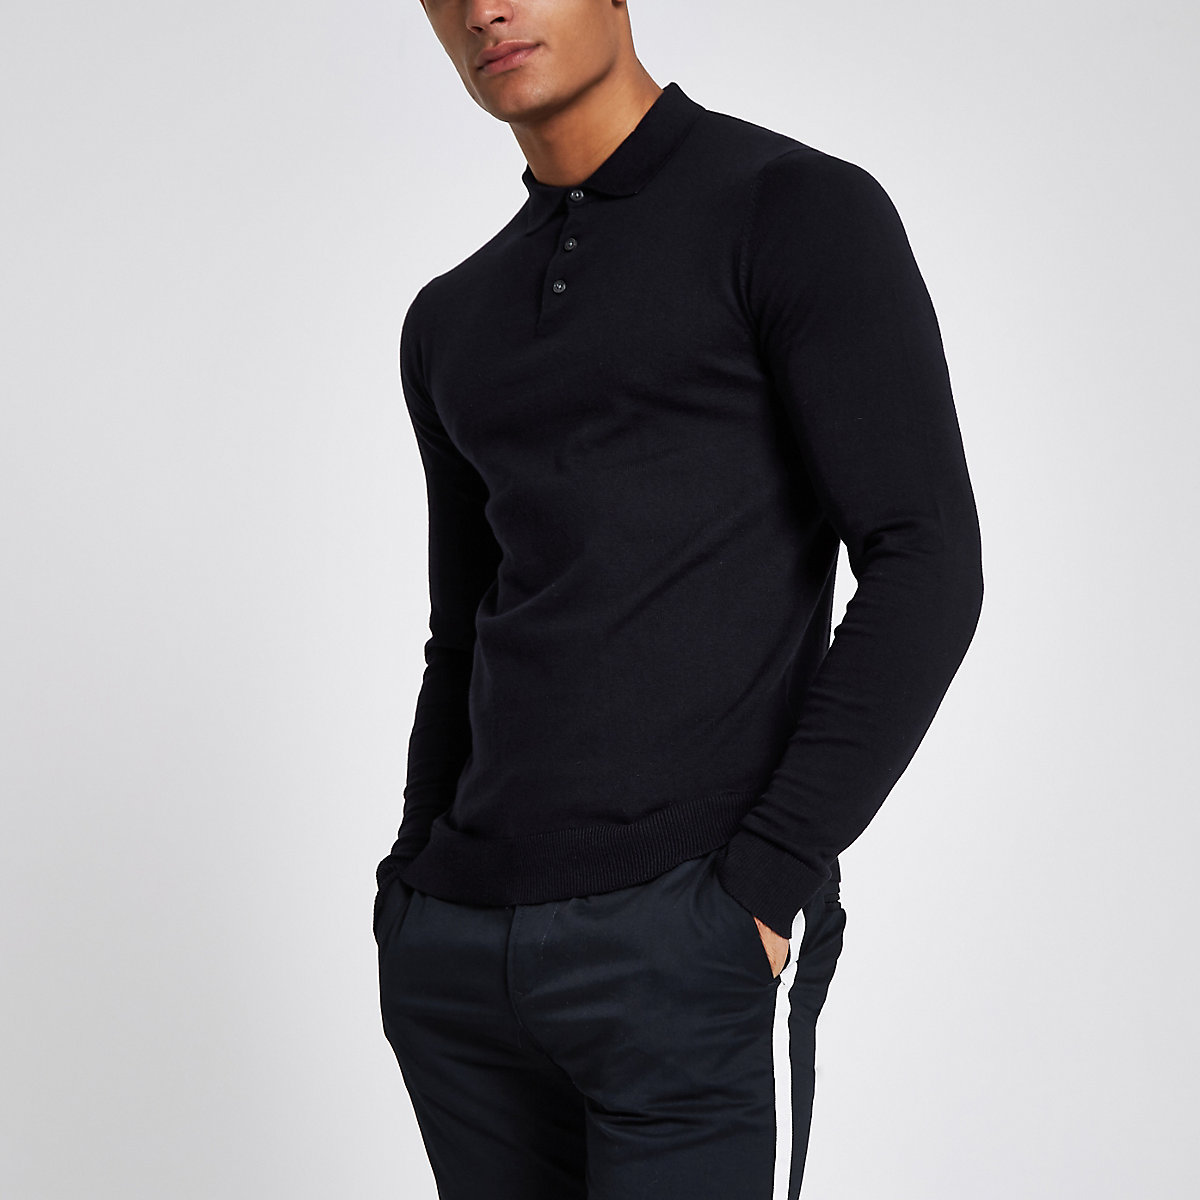 Jack & Jones Premium navy knitted polo shirt